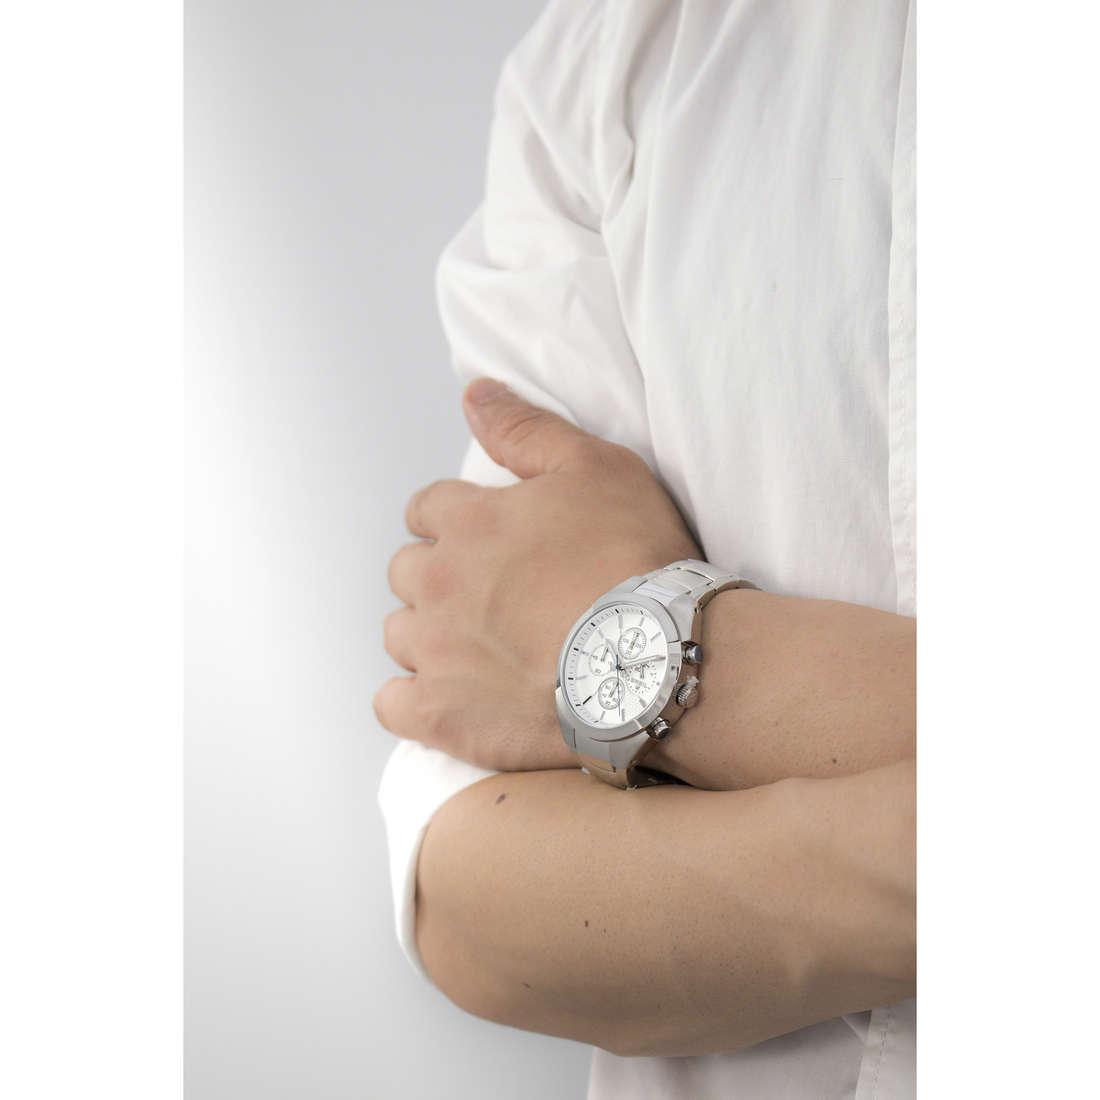 Breil cronografi Gap uomo TW1472 indosso